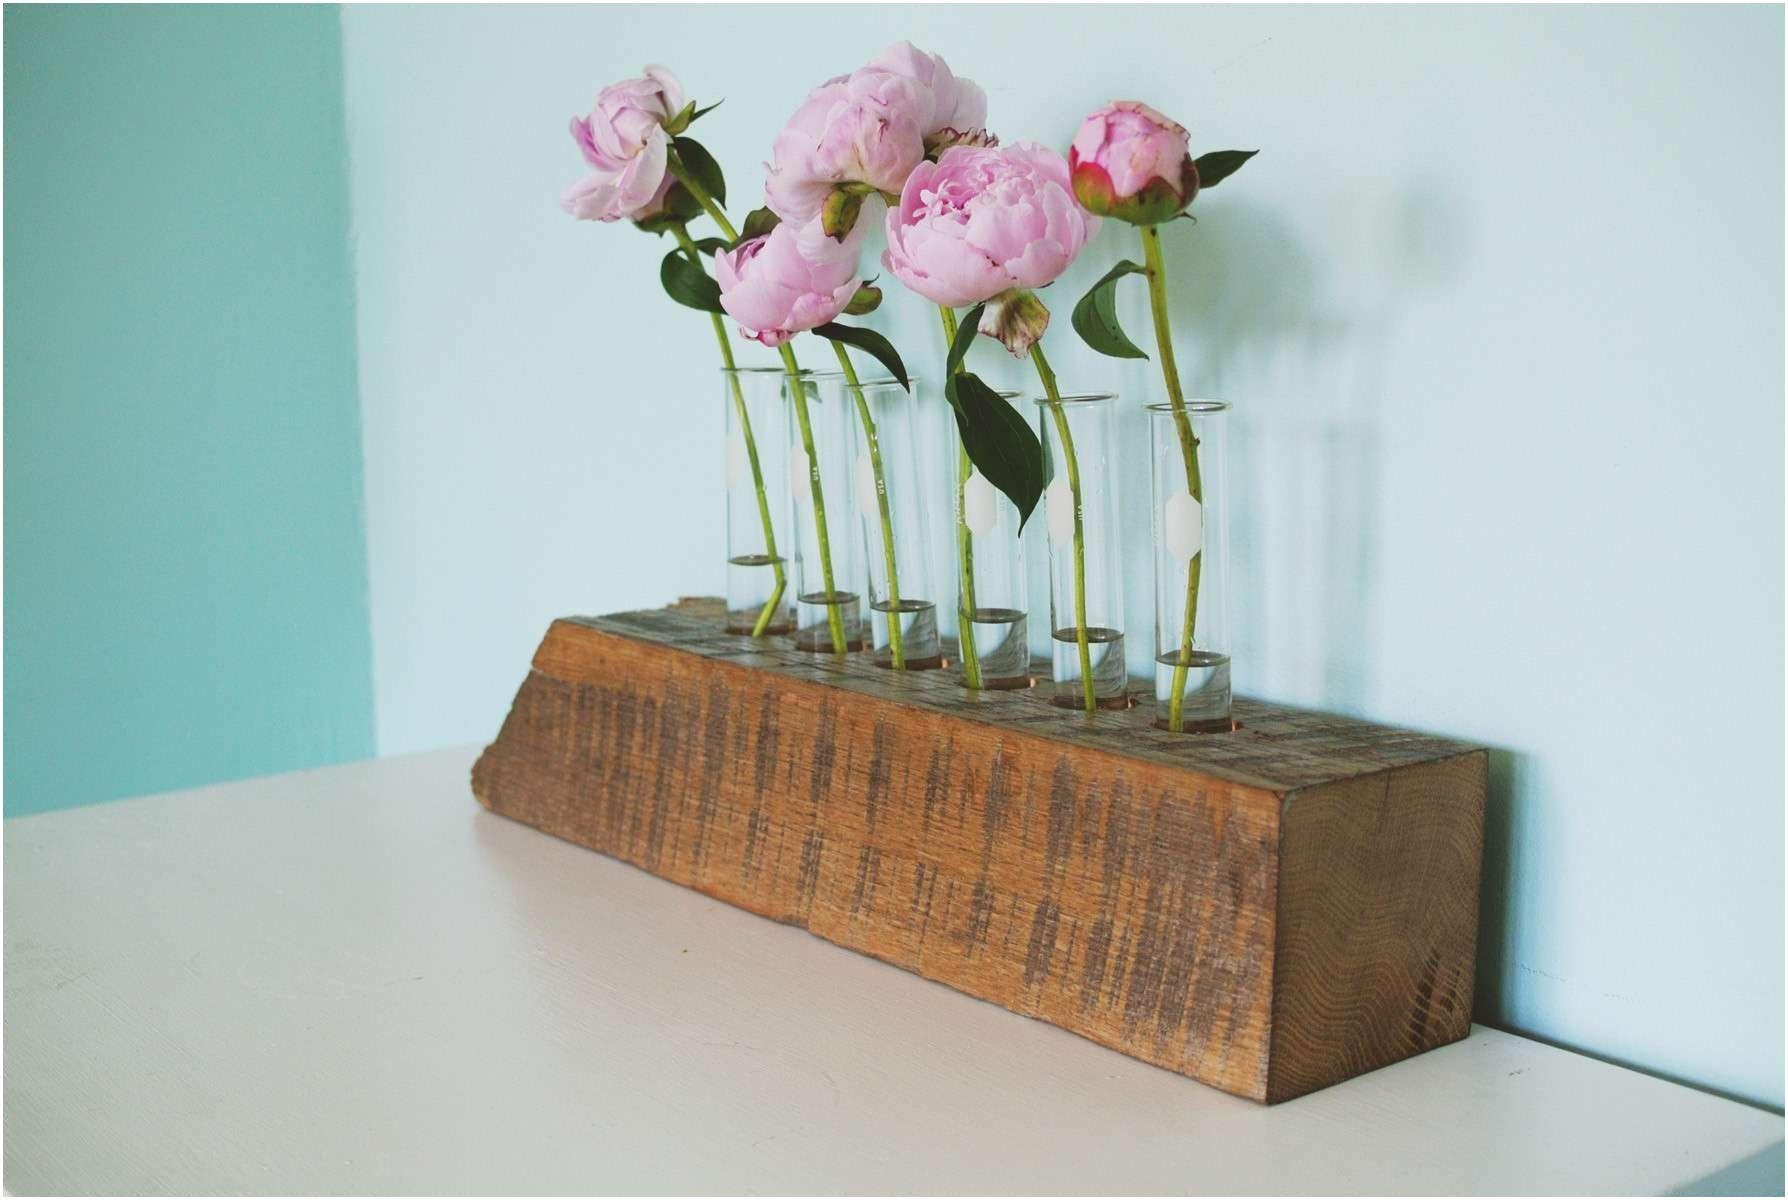 volkswagen bug flower vases of 23 flowers in a vase the weekly world inside flowers in a vase luxury flower arrangements staggering vases vase for e flower shaffa i 0d of flowers in a vase